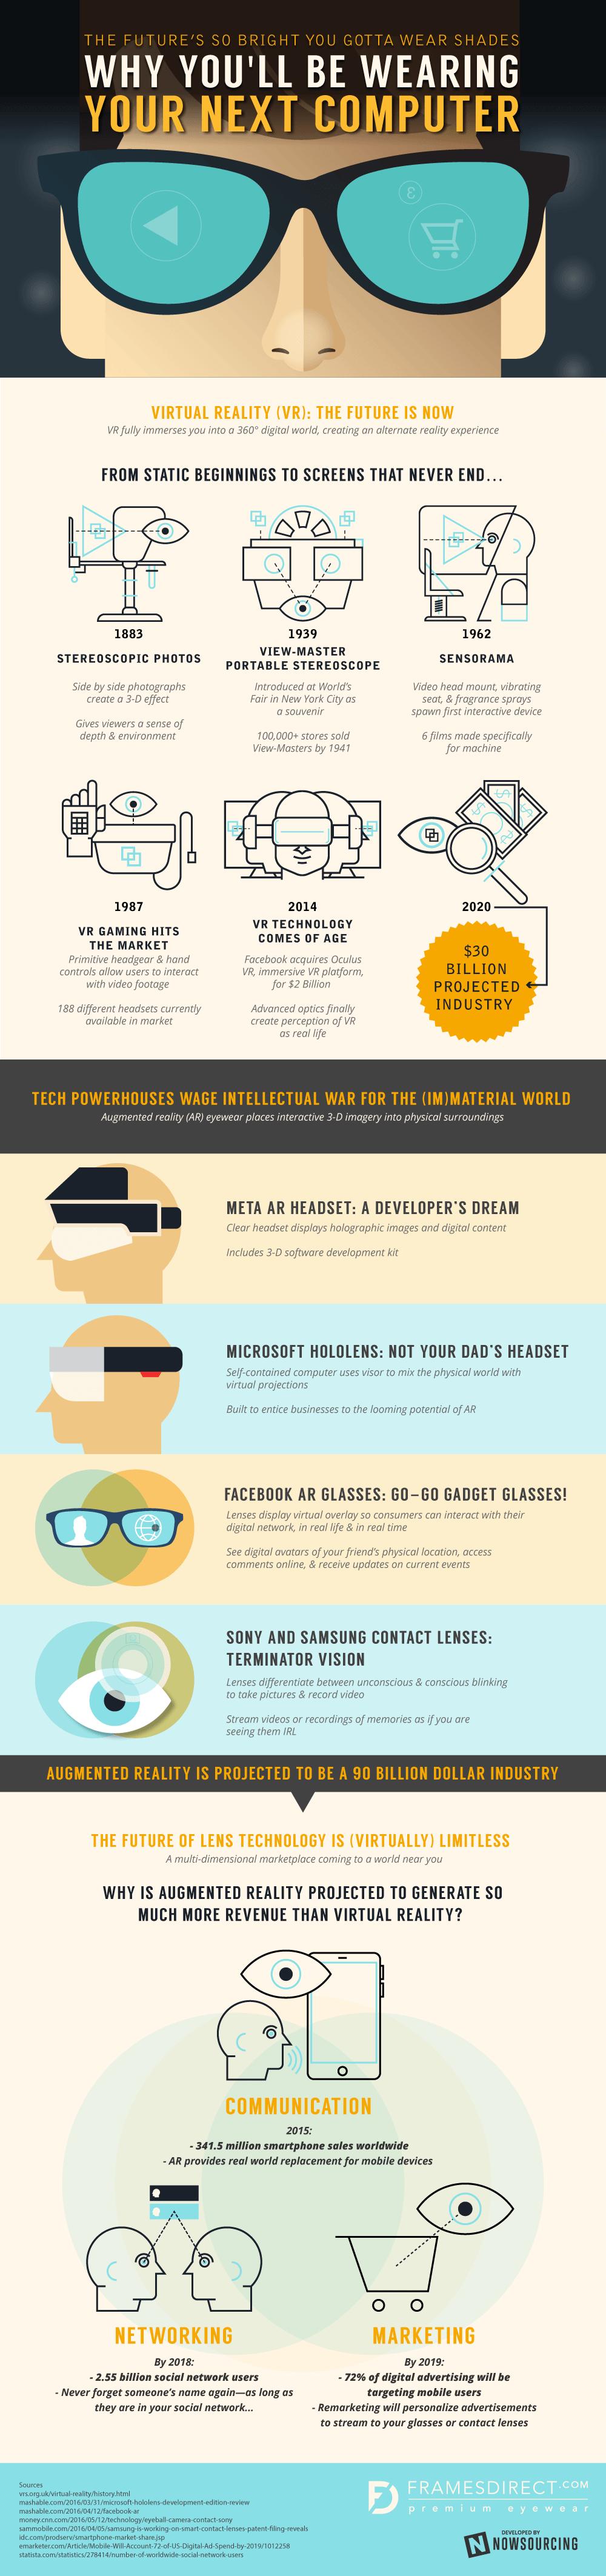 frames-direct-lp-virtual-reality-glasses1